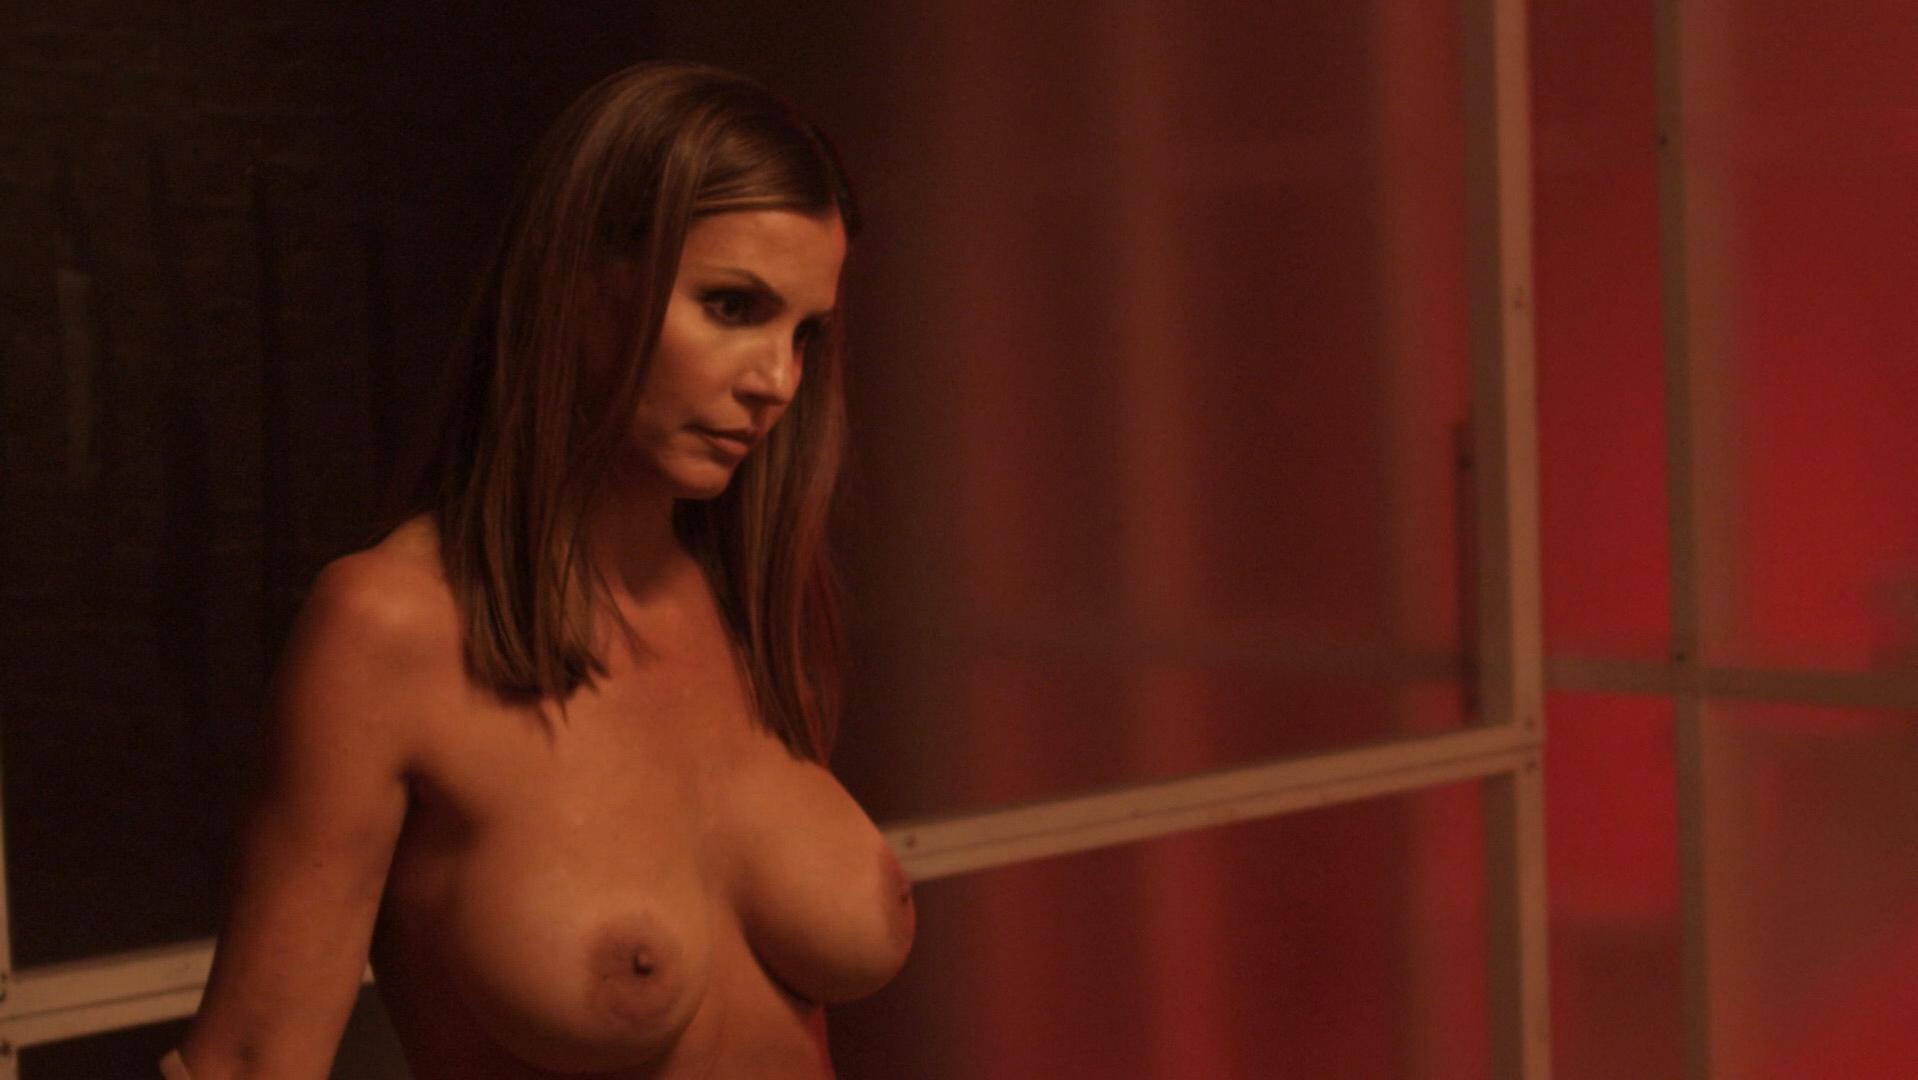 Charisma carpenter naked nude